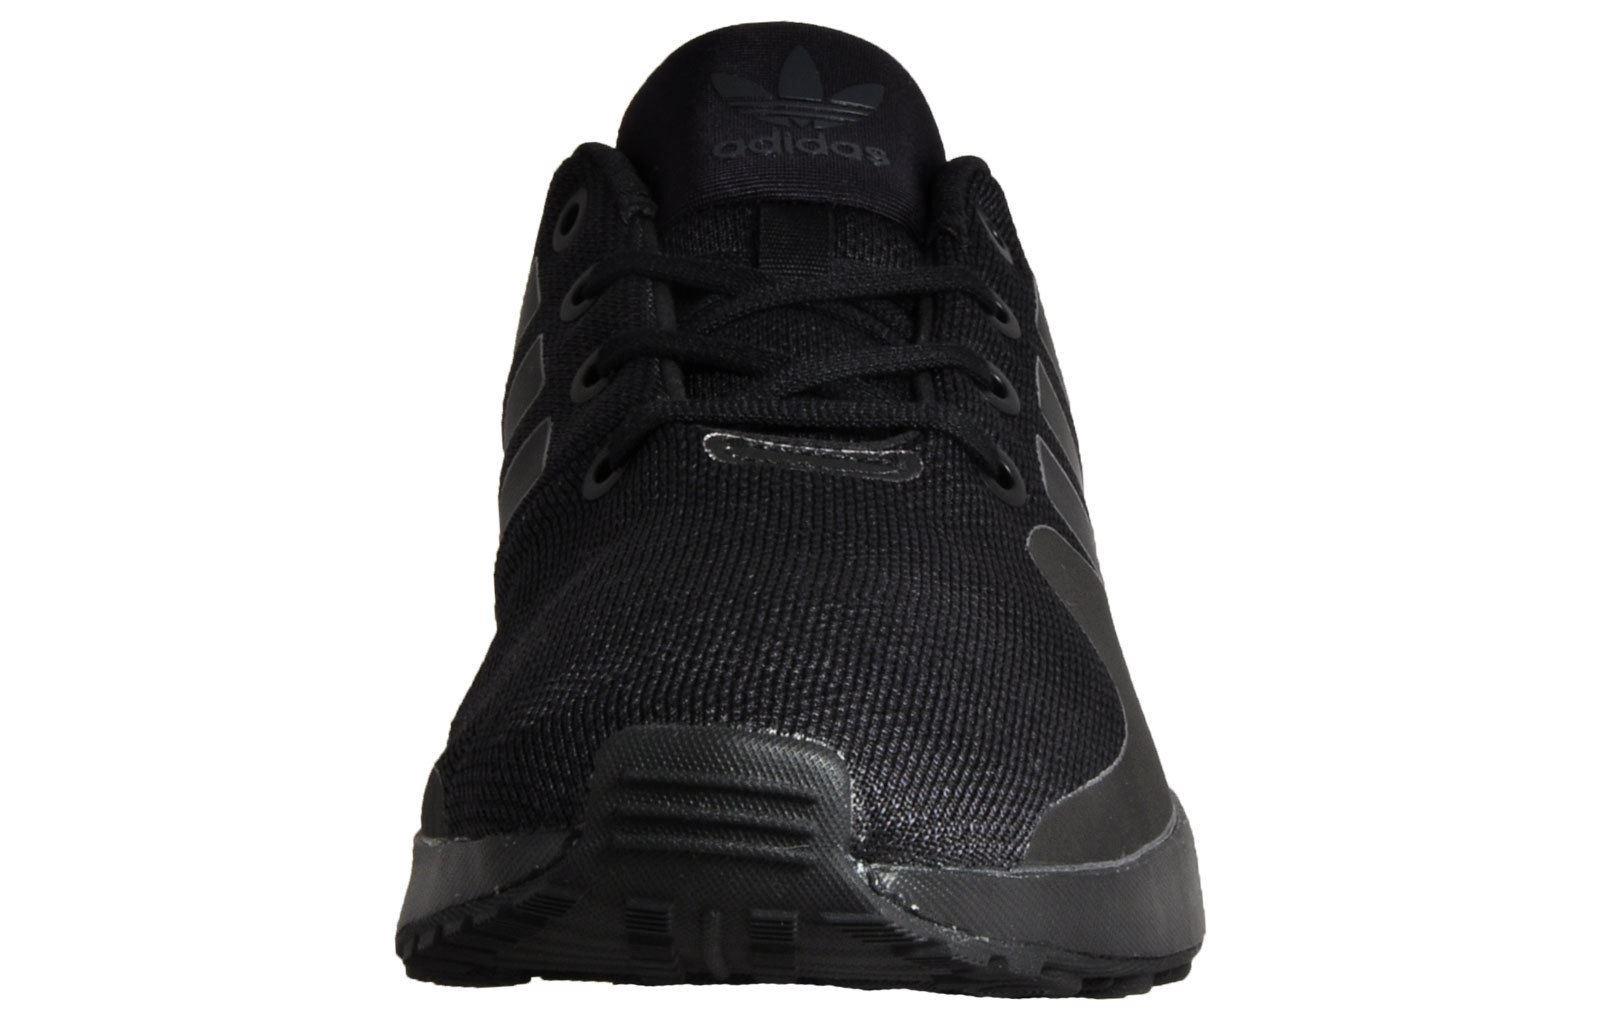 86d0a5f06 ... adidas Originals ZX Flux ADV Tech Trainers Mens Black Sneakers Shoes  Footwear